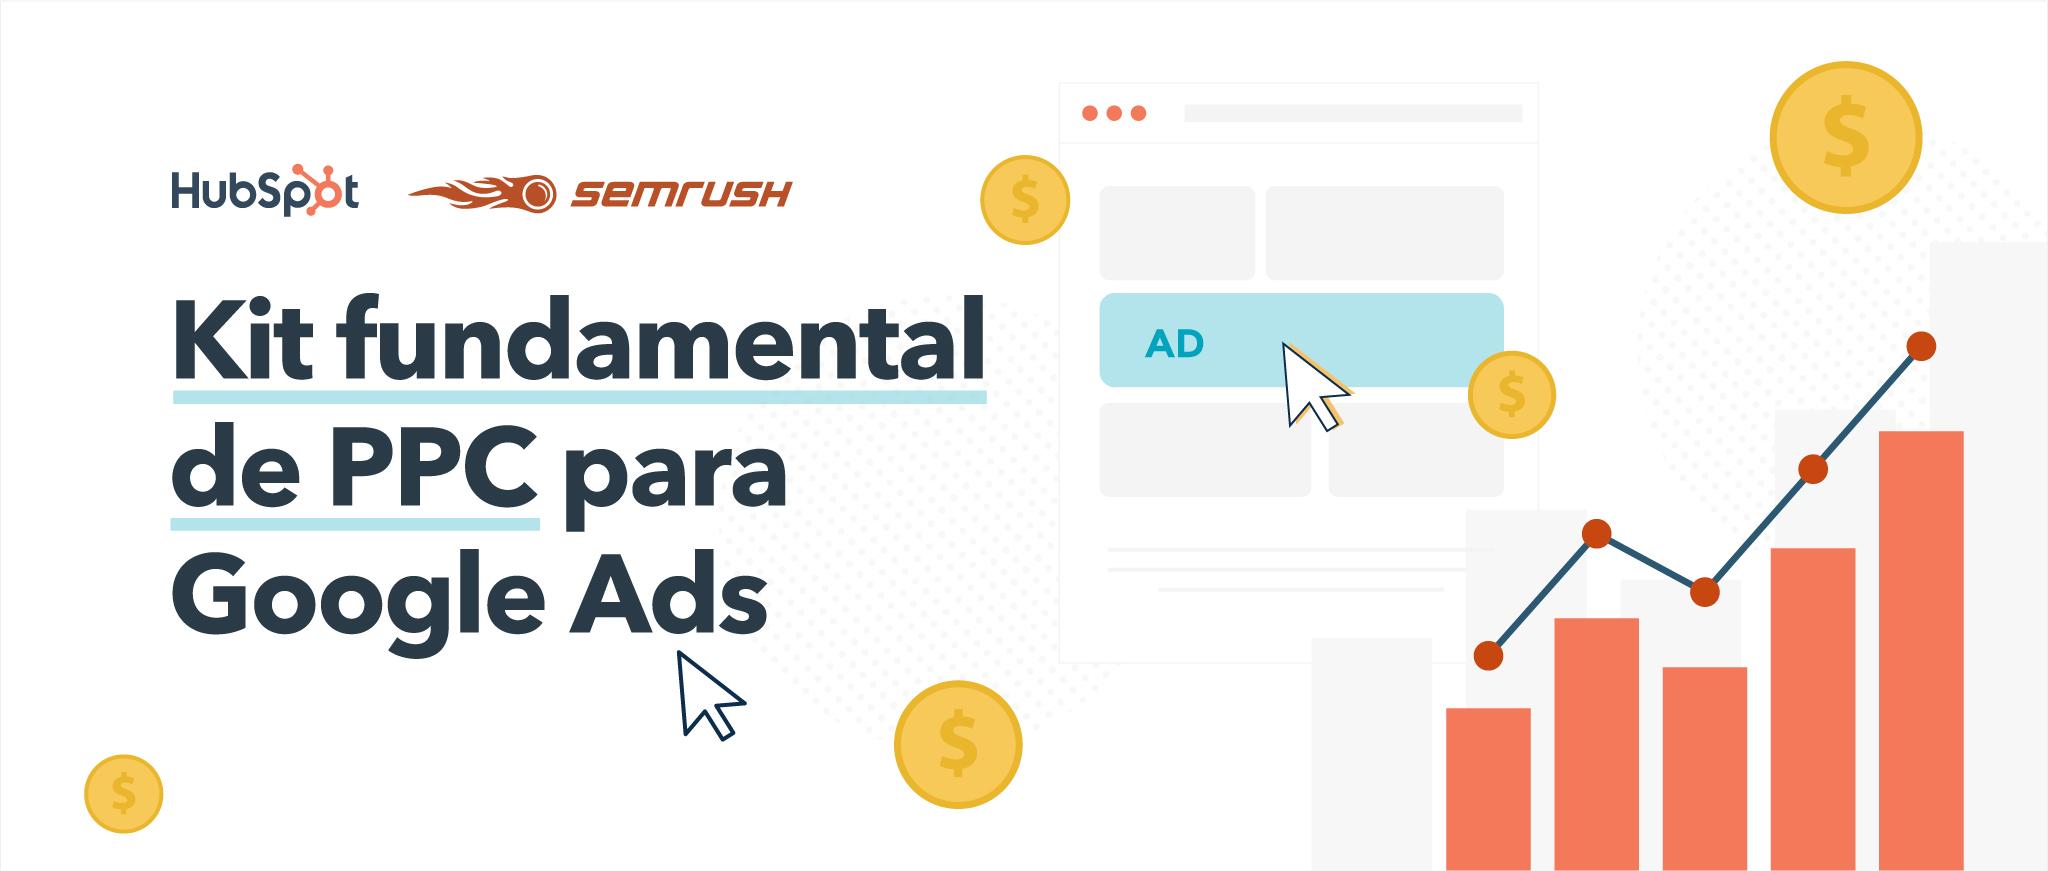 Kit fundamental de PPC para Google Ads